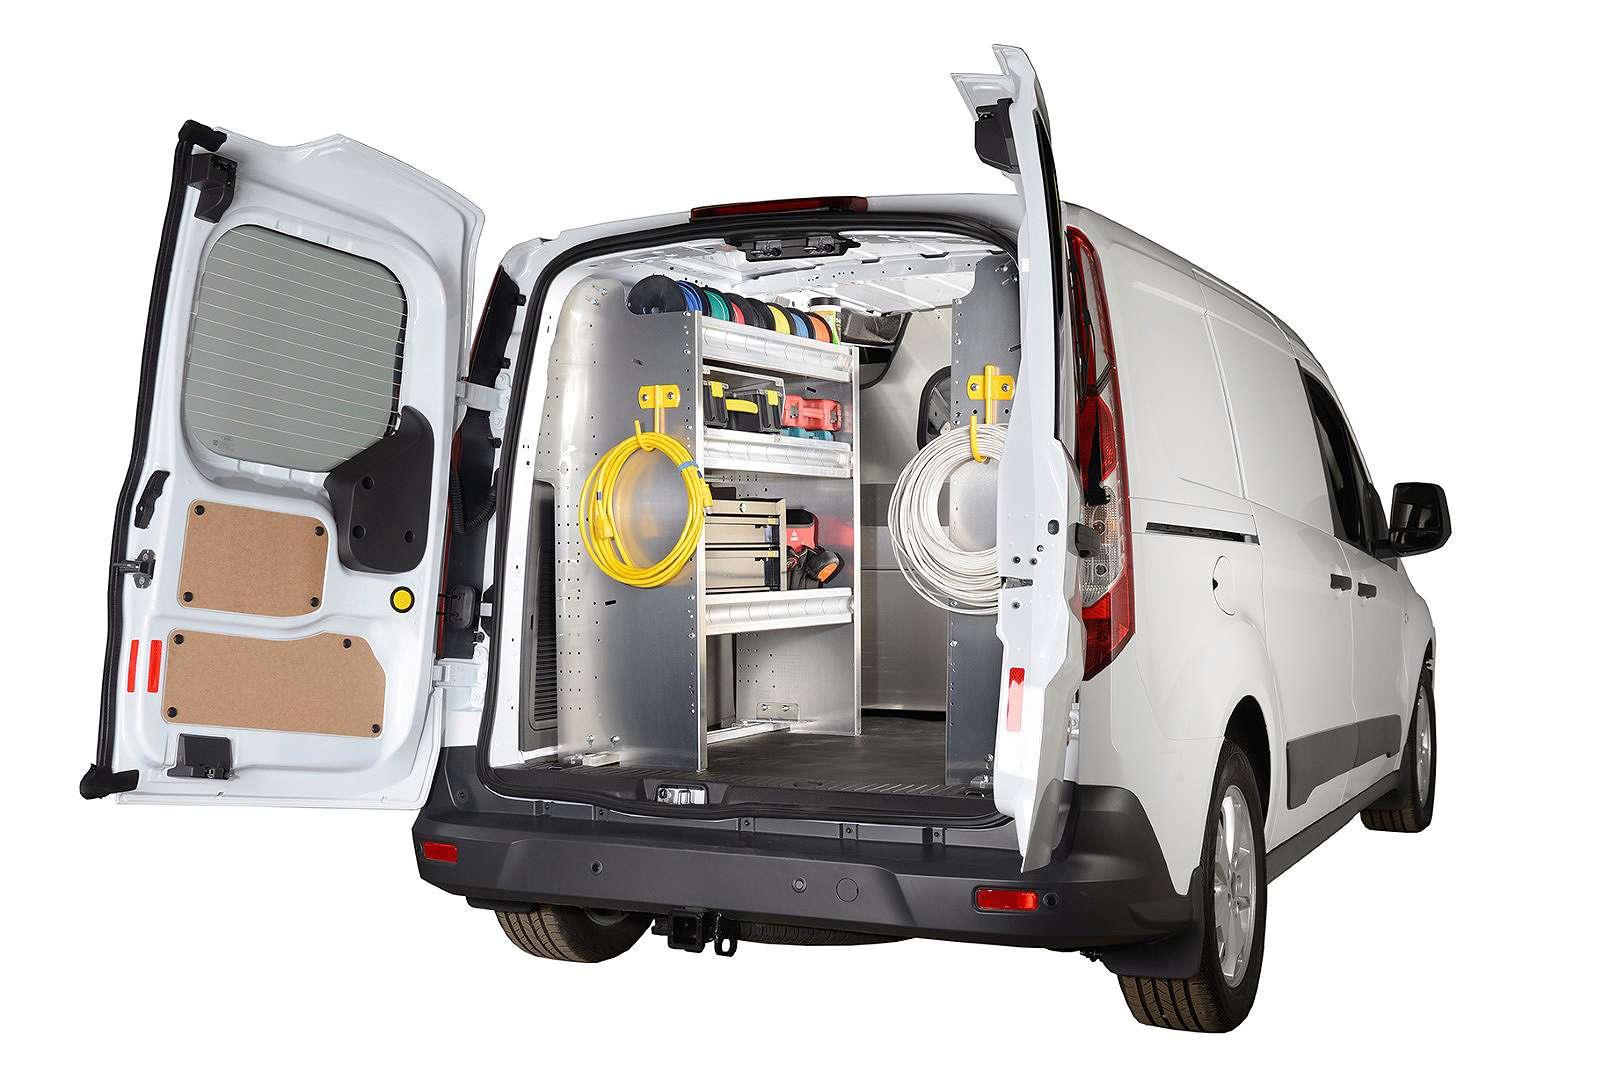 ranger design electrician package van packages campway. Black Bedroom Furniture Sets. Home Design Ideas